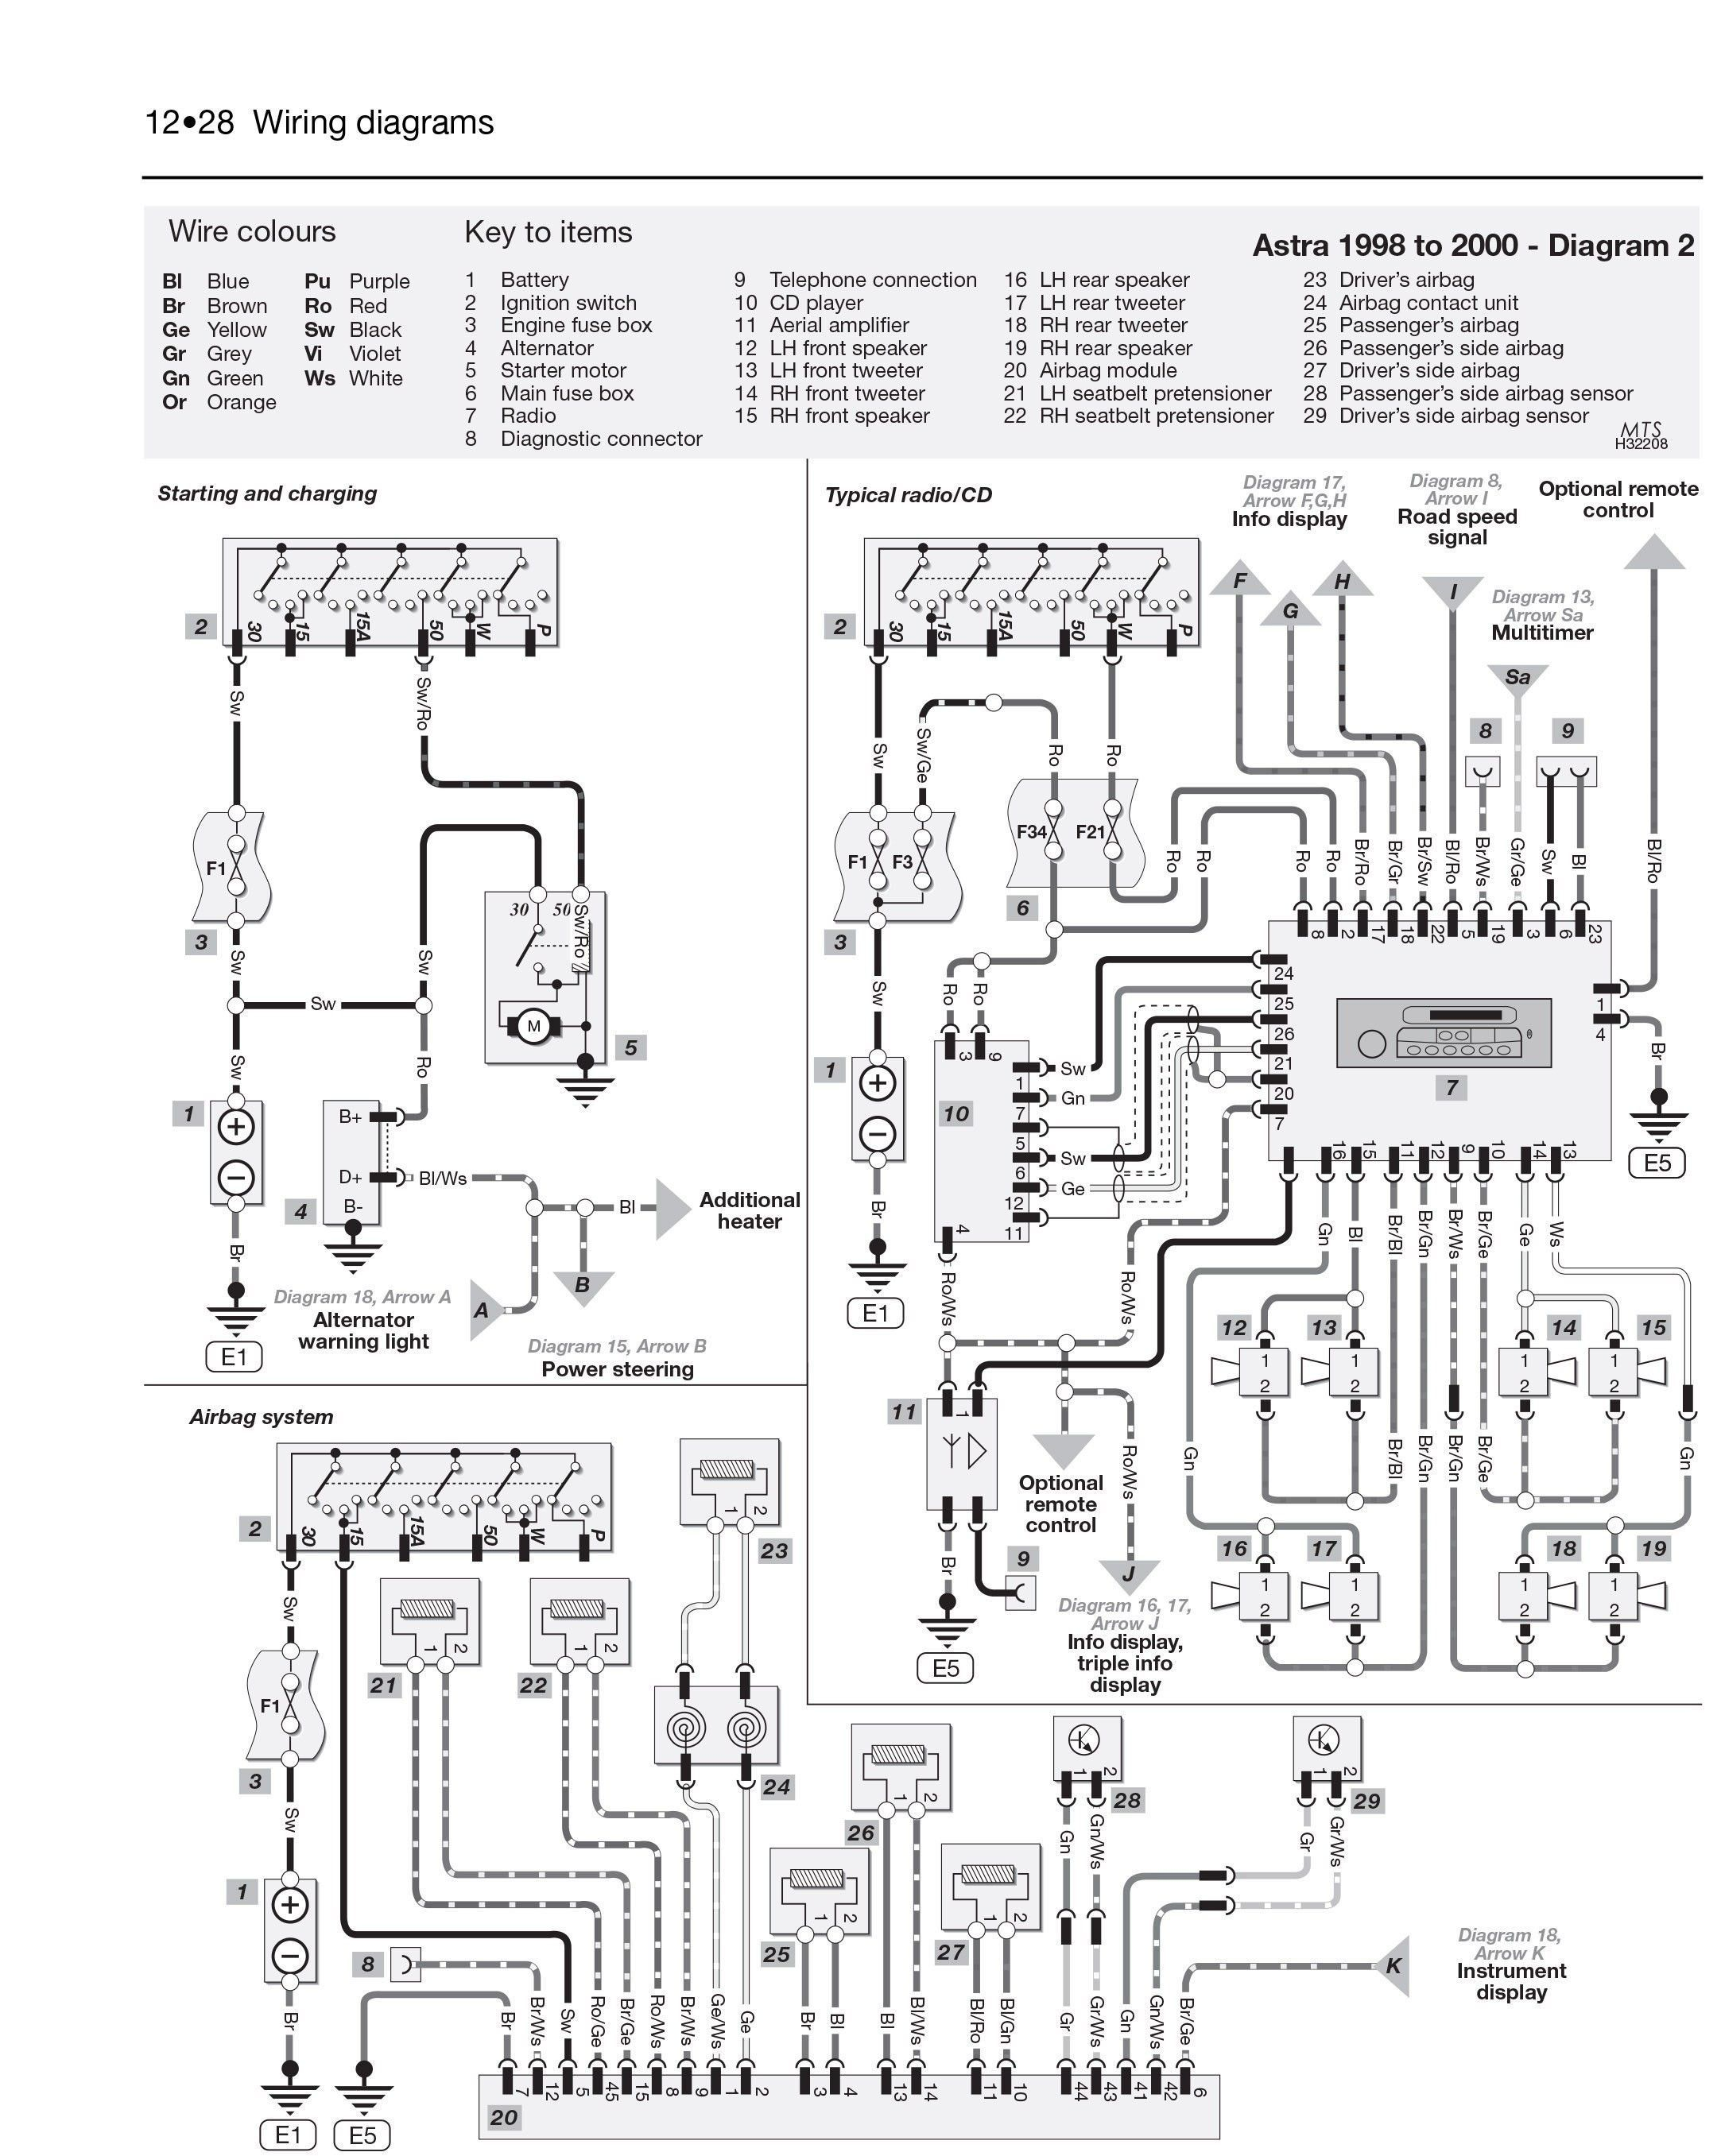 New Fire Alarm System Wiring Diagram Pdf  Diagramsample